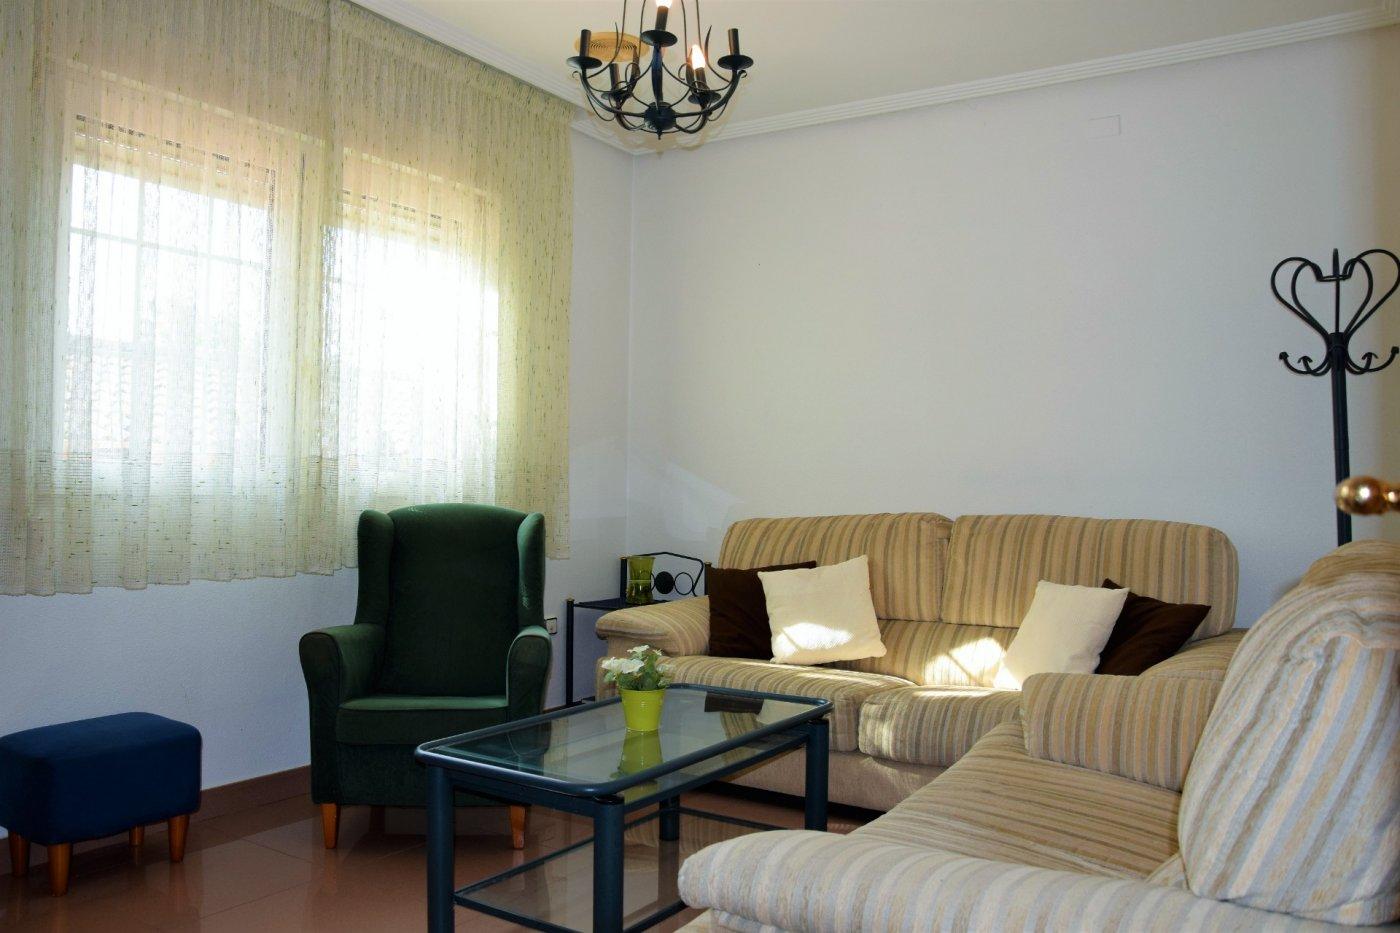 Chalet en Murcia www.joaquincarceles.com JC174 (18)